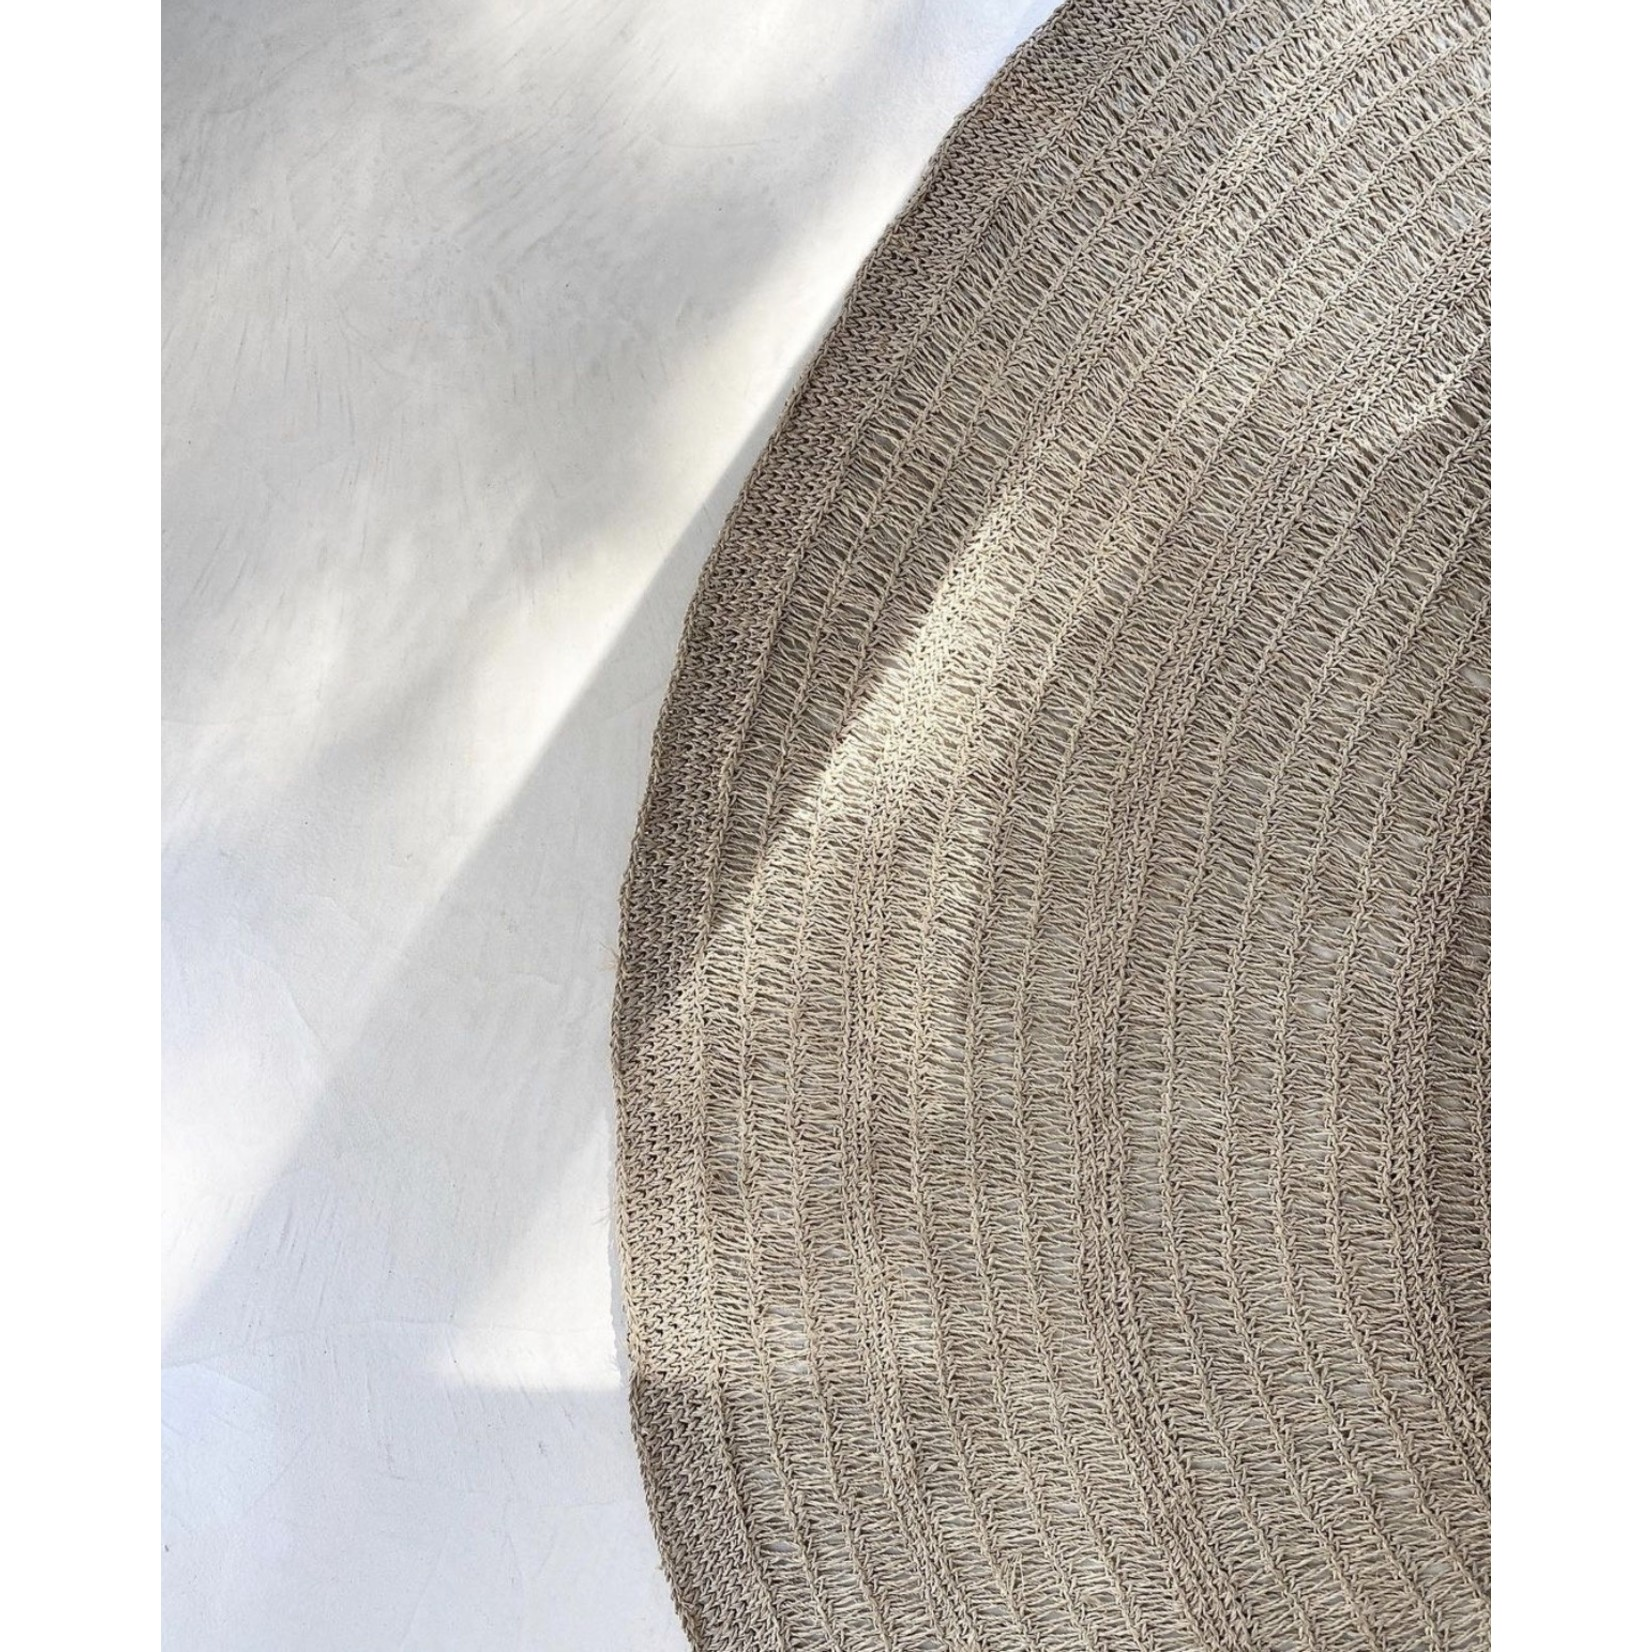 Bazar Bizar De Seagrass Tapijt - Naturel - 200cm